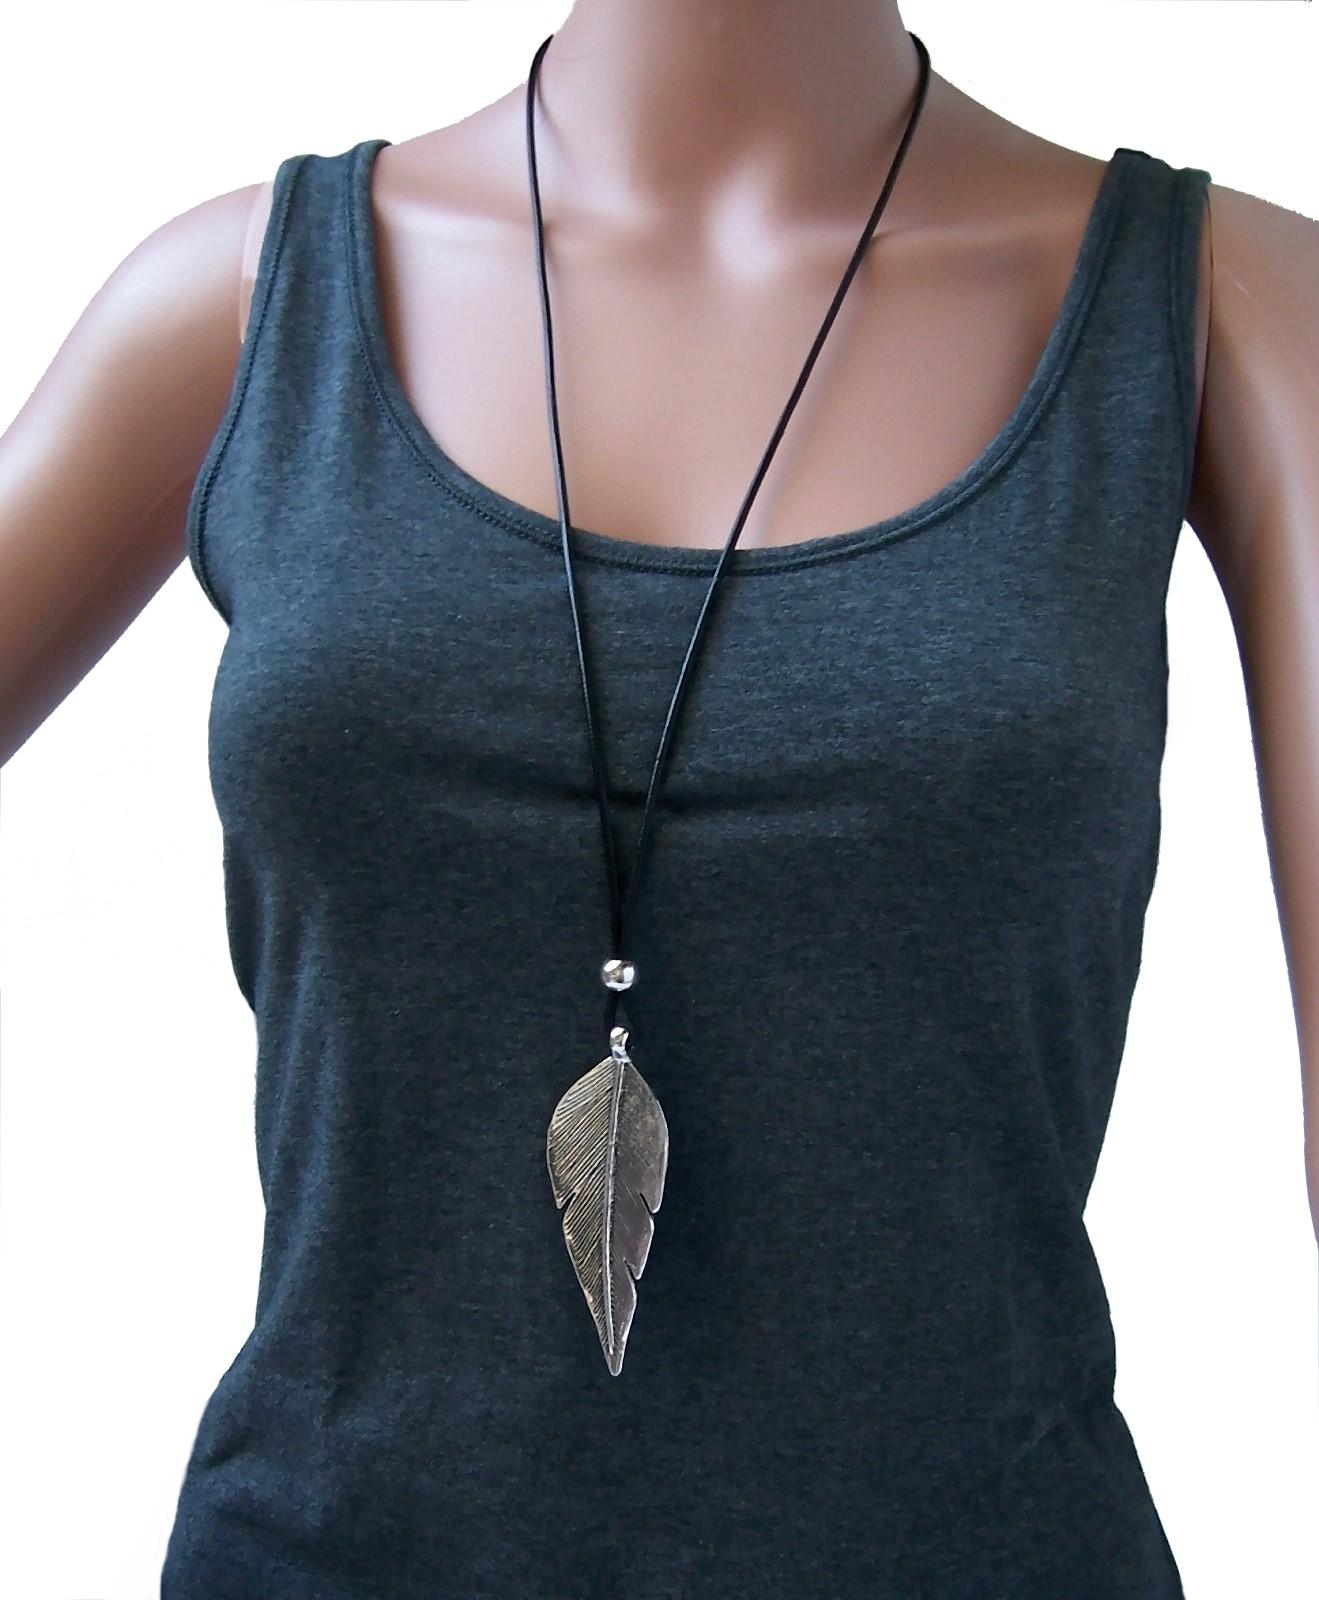 Kette lange Halskette Lederlook schwarz Blatt Anhänger silber K1865